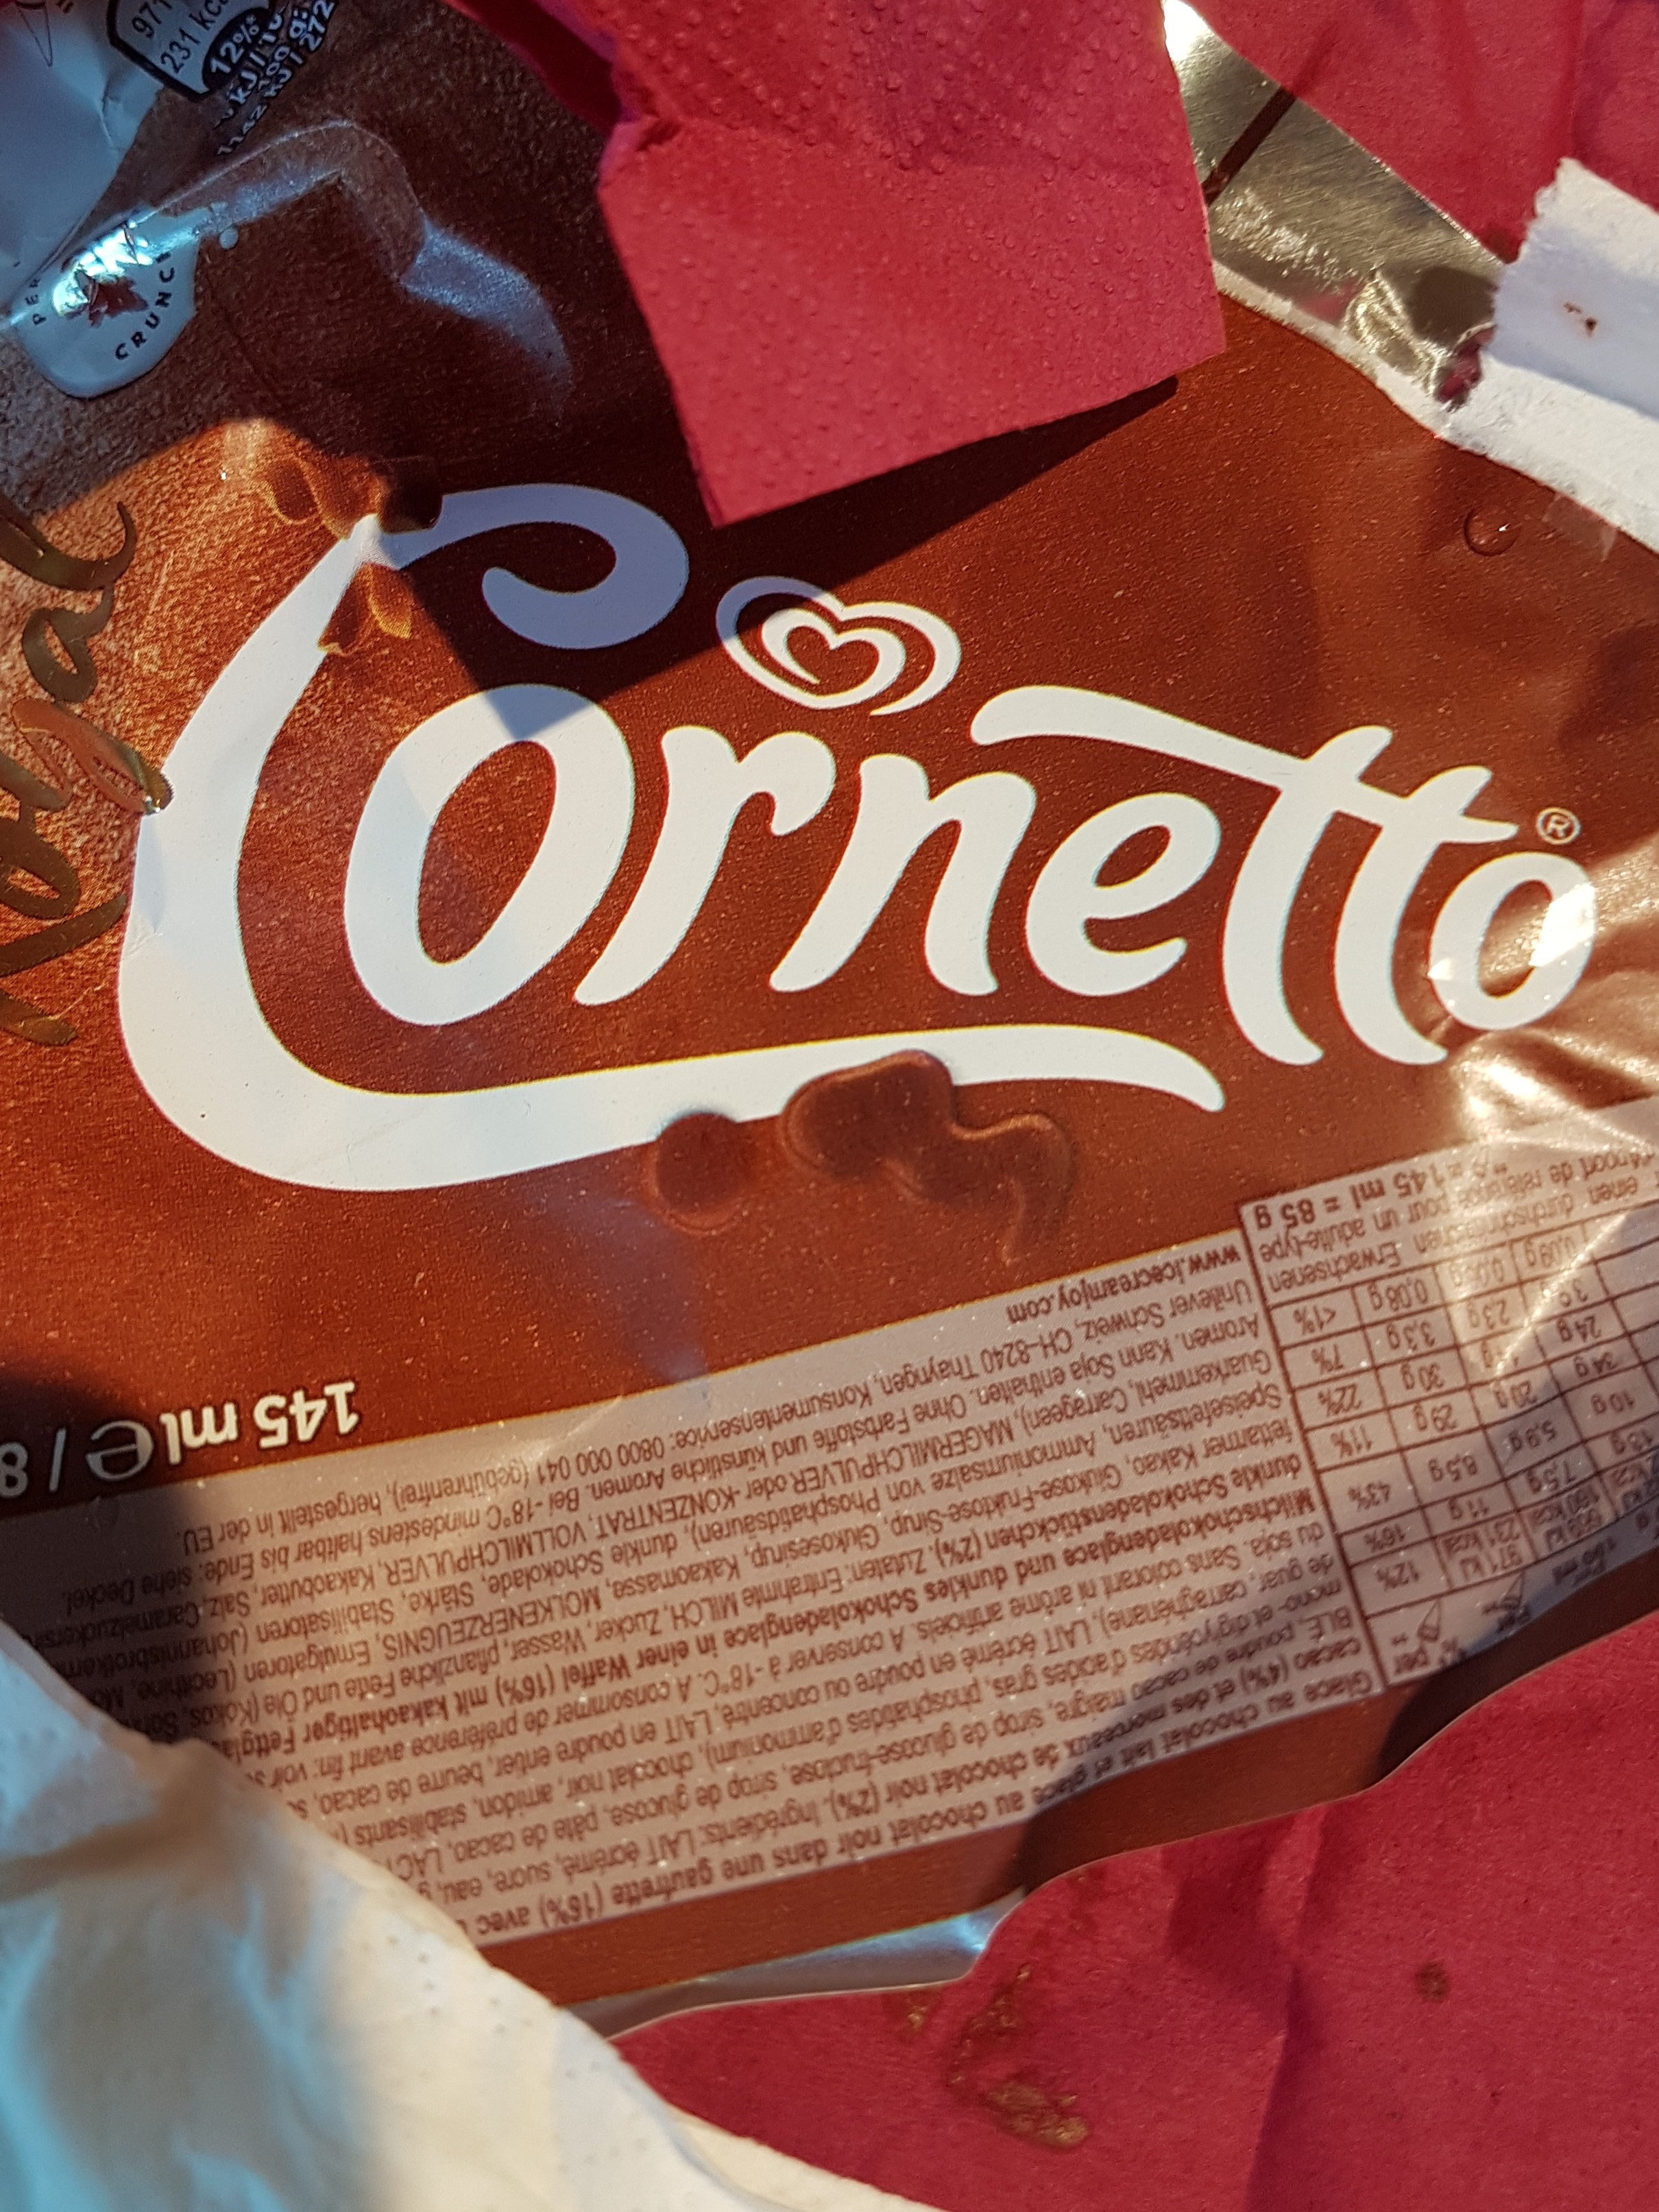 cornetto - Product - fr